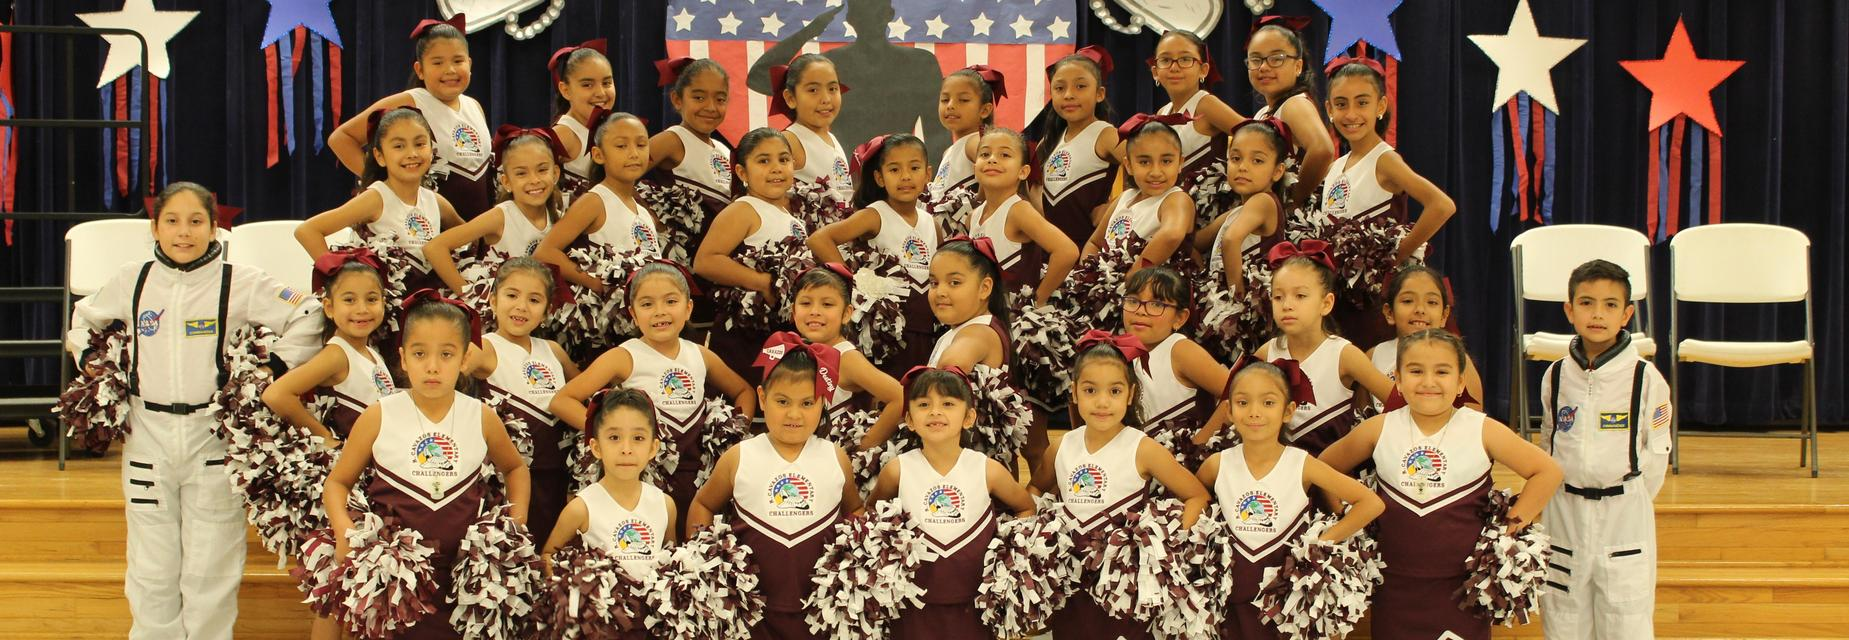 Cavazos Cheer Squad